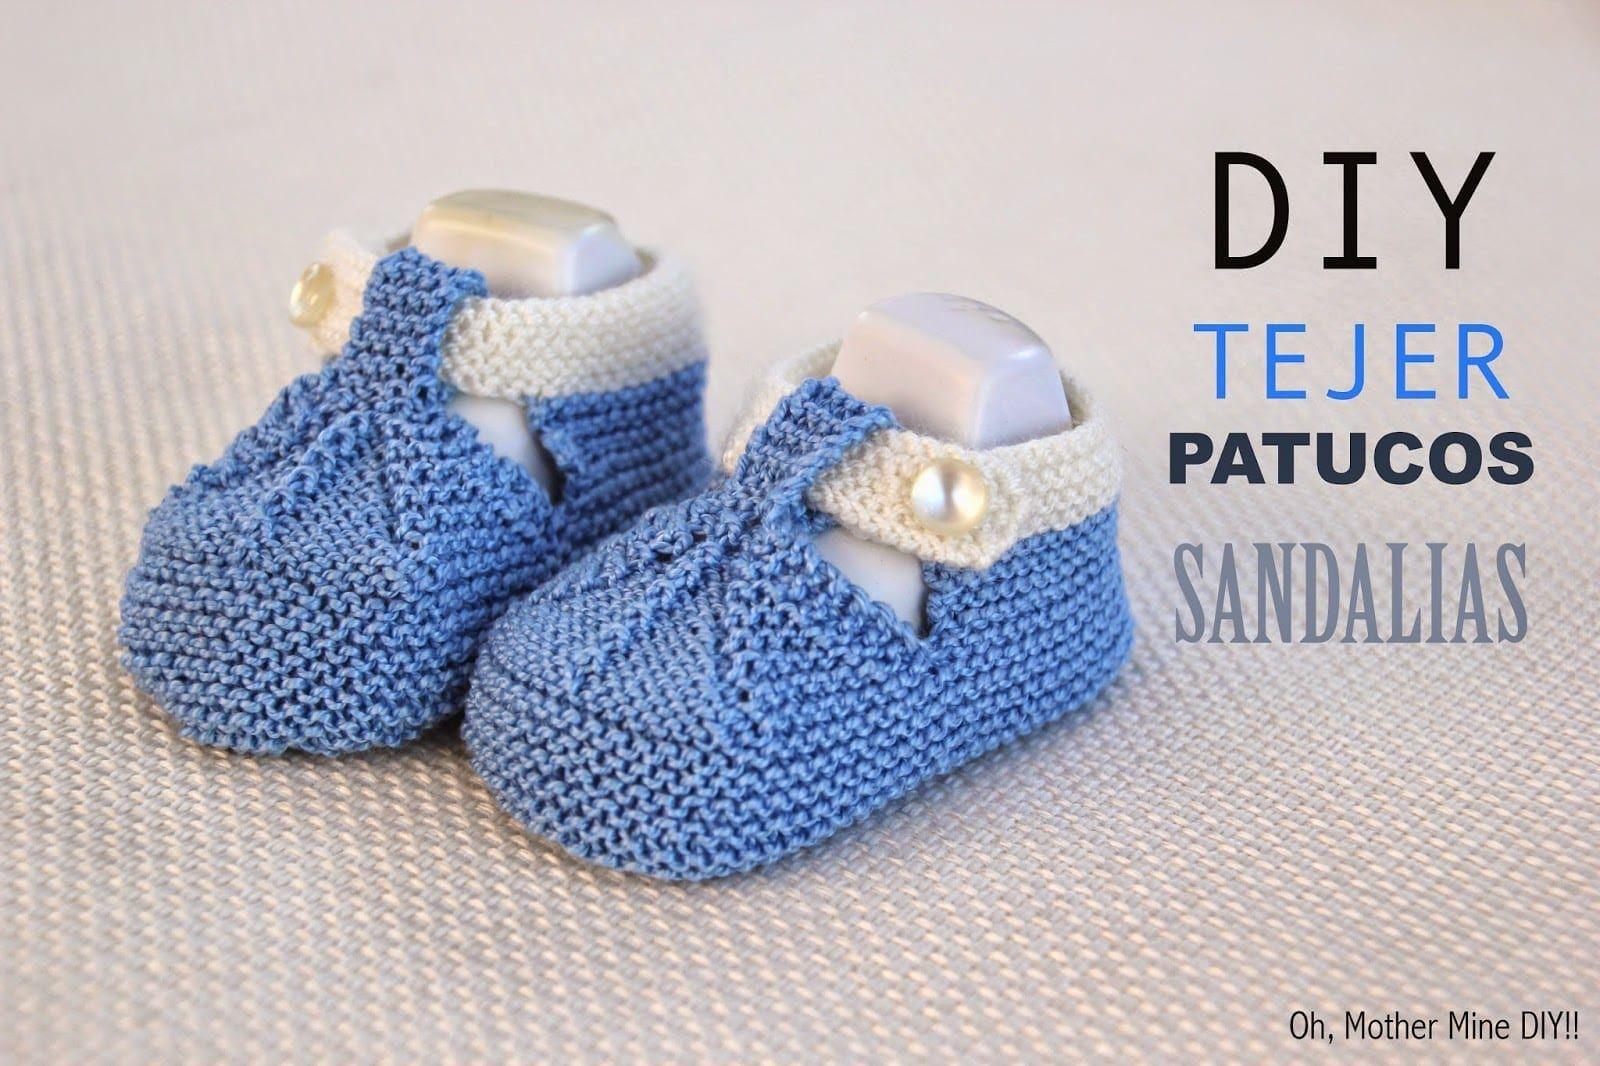 Pin De Christine Hermanowski En Tutos Gracieux Pour Bouille à Bisous Sandalias Para Bebe Gorro Bebe Dos Agujas Zapatos De Bebé